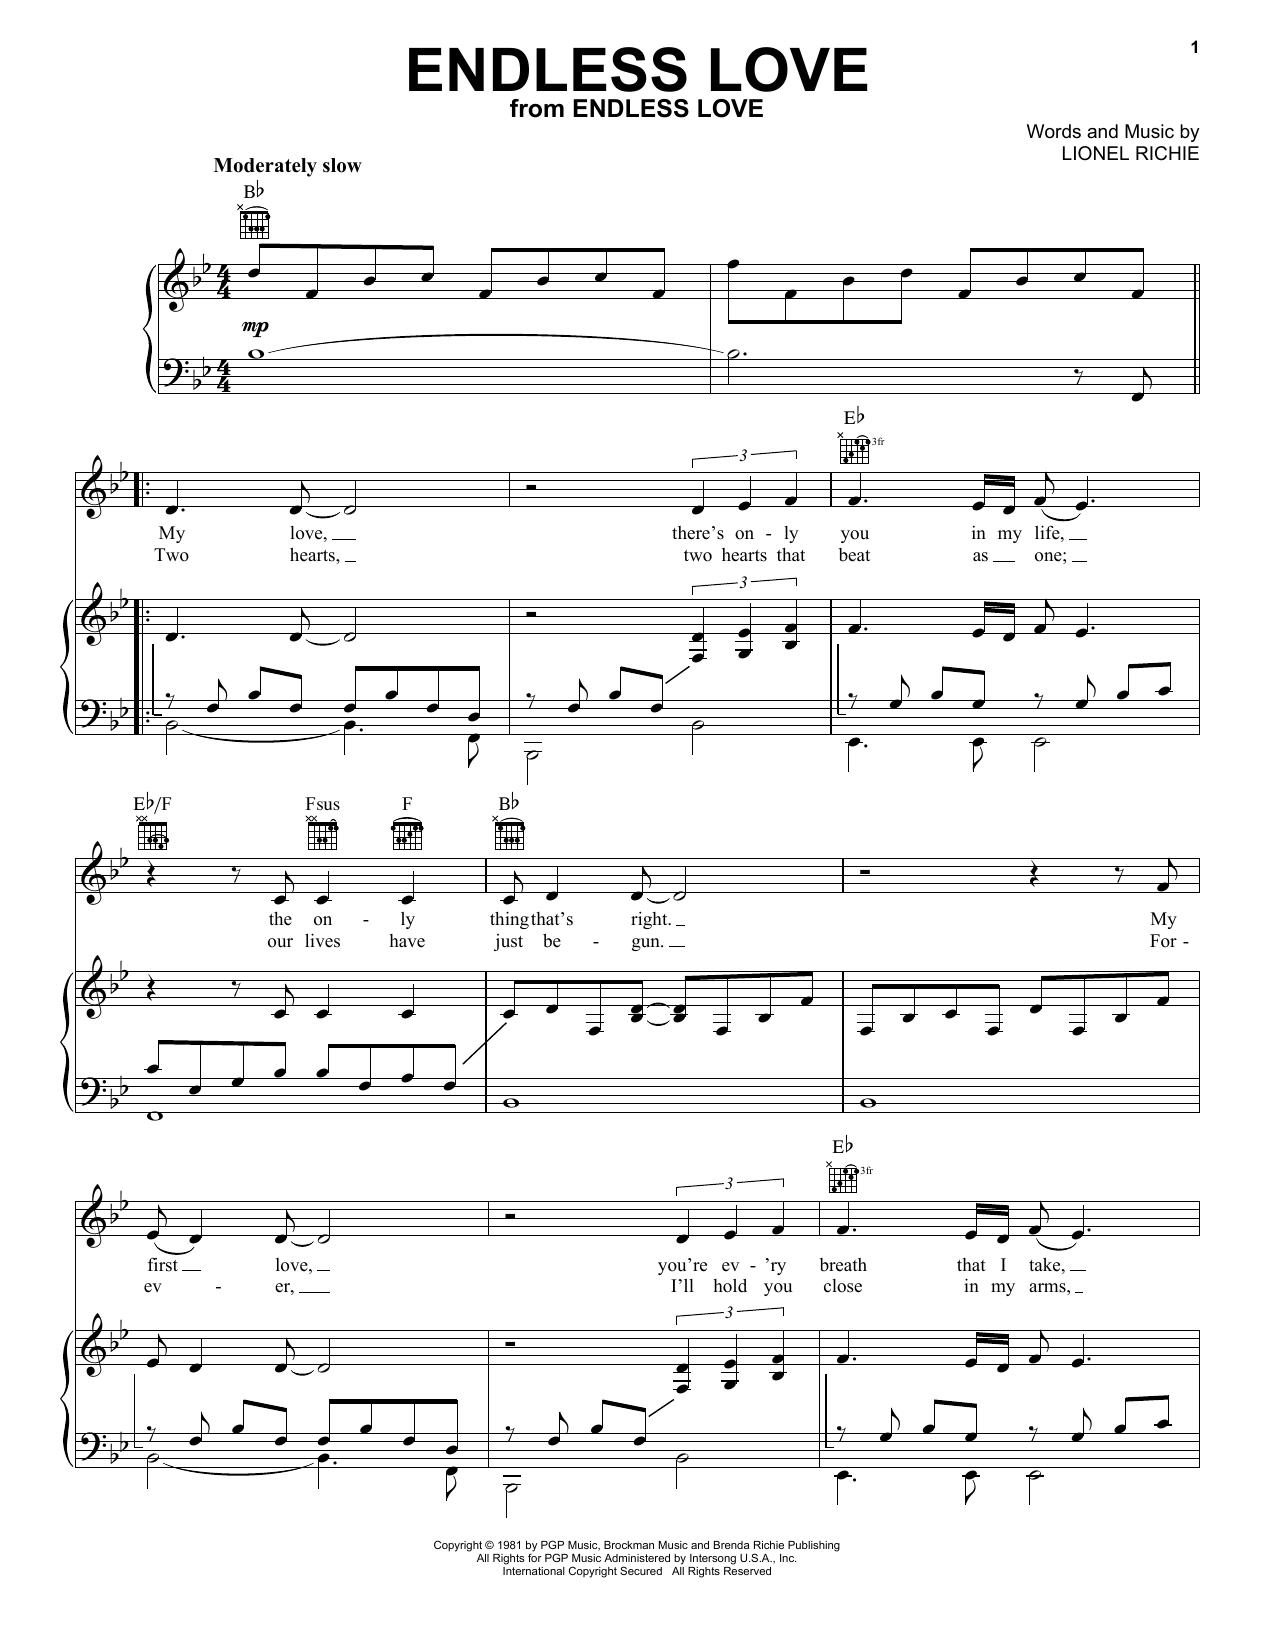 Lionel Richie & Diana Ross Endless Love sheet music notes printable PDF score